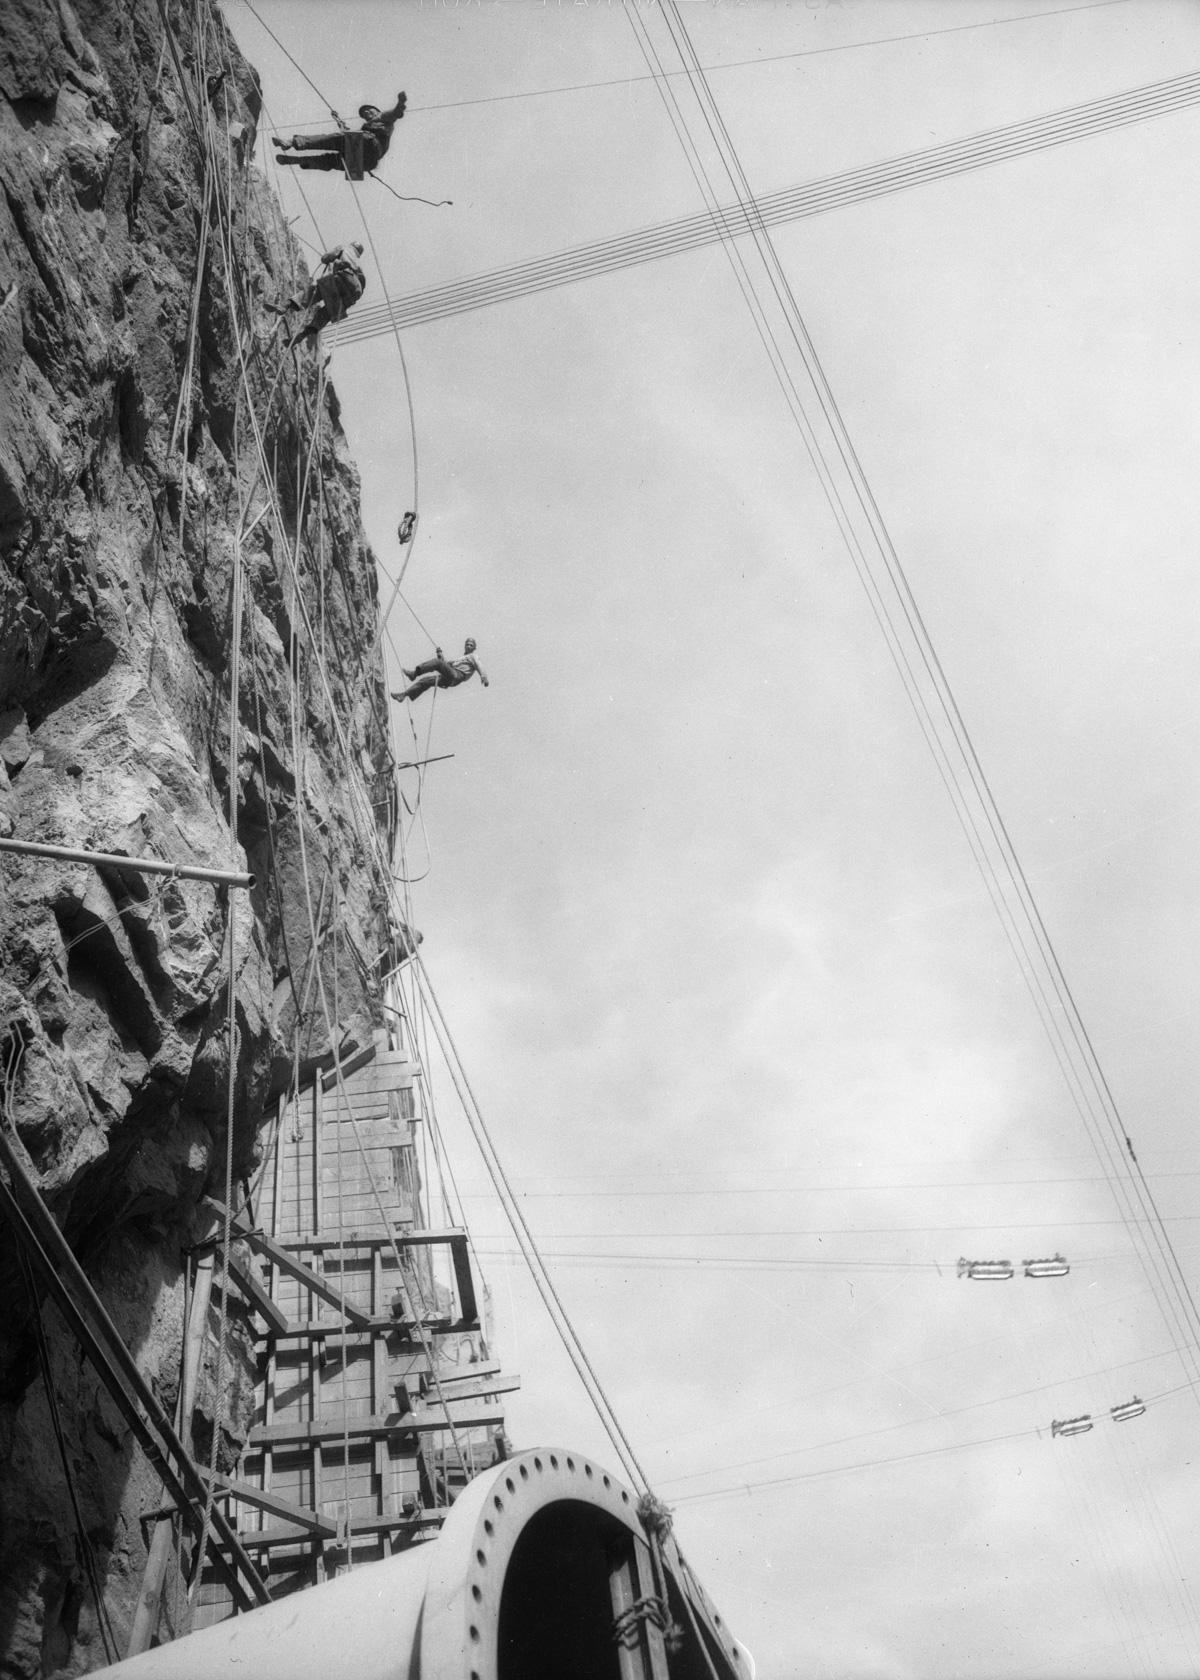 1934 --- Contruction workers rappel down cliff face dw-1934-12-08-70~09 --- Image by © Dick Whittington Studio/Corbis